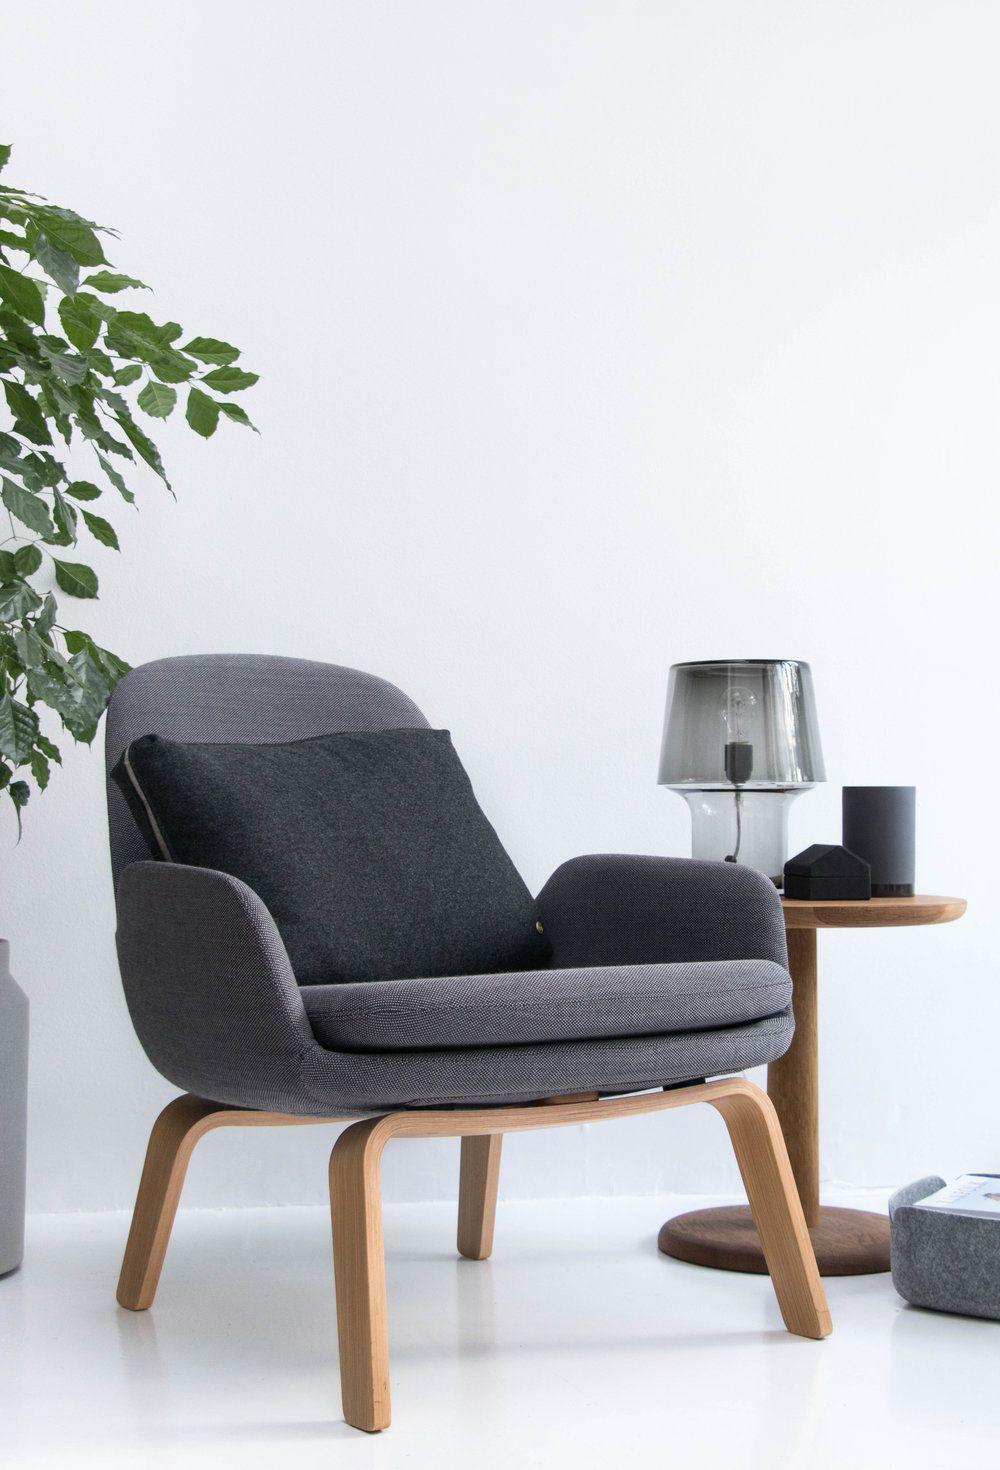 Admirable Era Lounge Chair Normann Copenhagen Styling Crioll Camellatalisay Diy Chair Ideas Camellatalisaycom